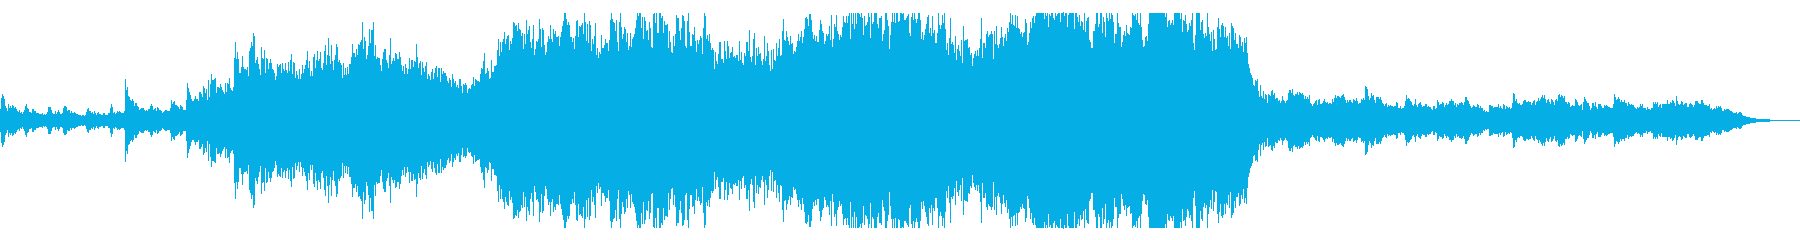 Sky Blue 60秒打楽器無しの再生済みの波形